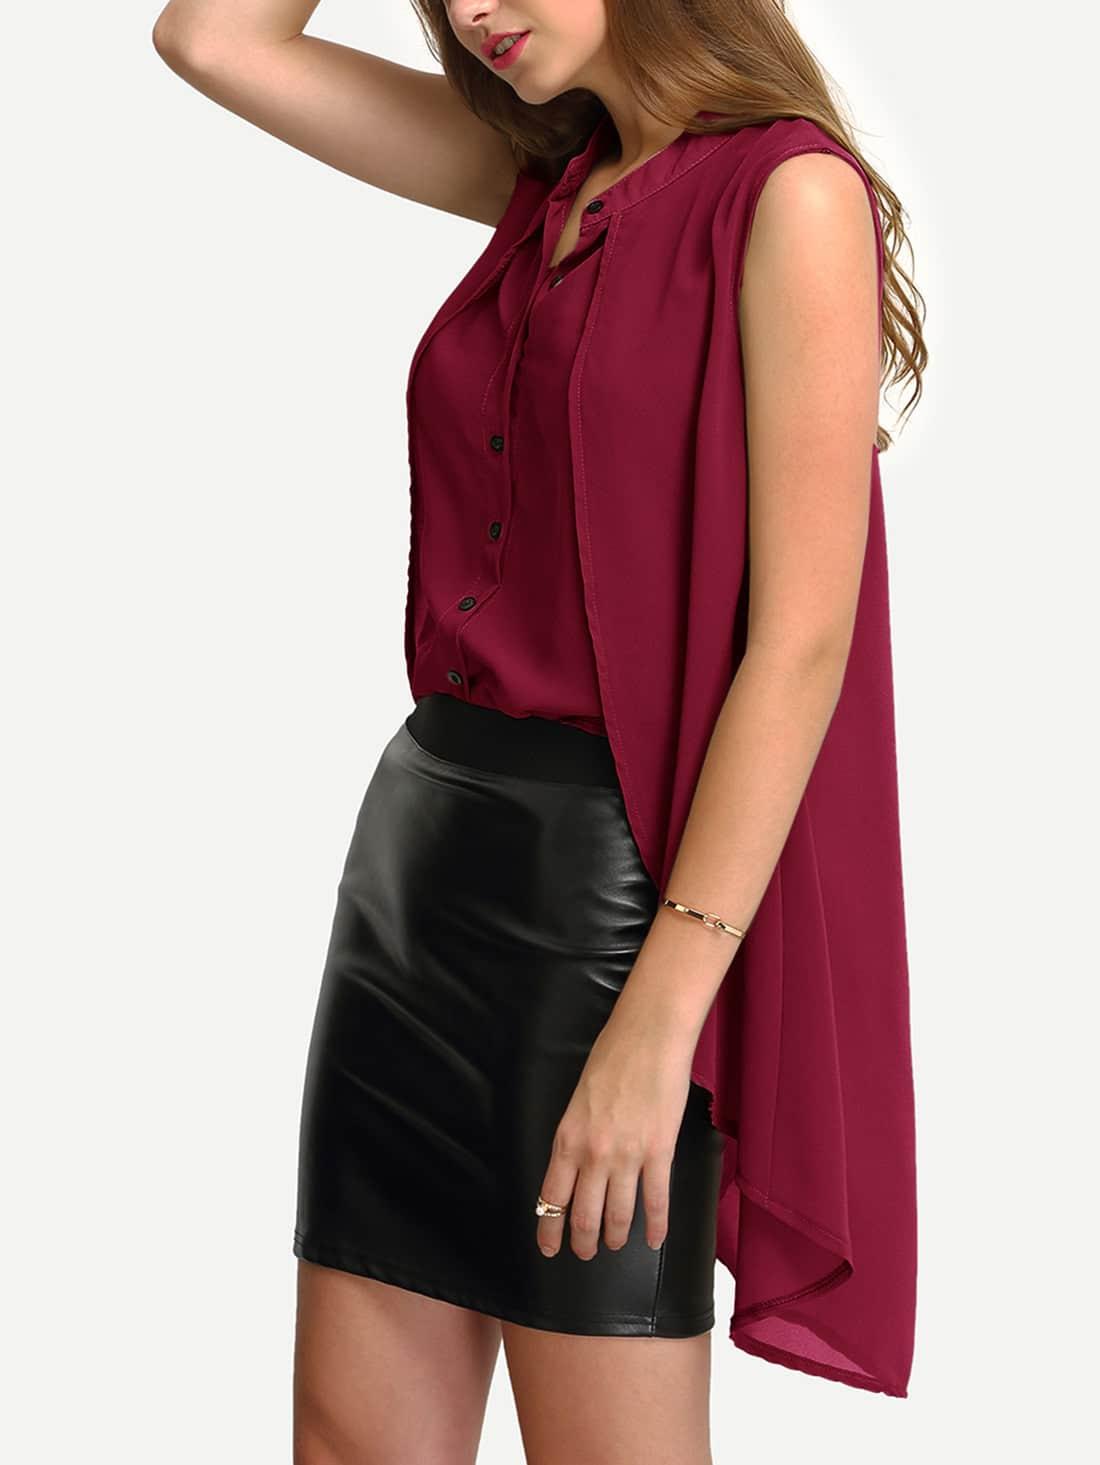 blouse170516115_2